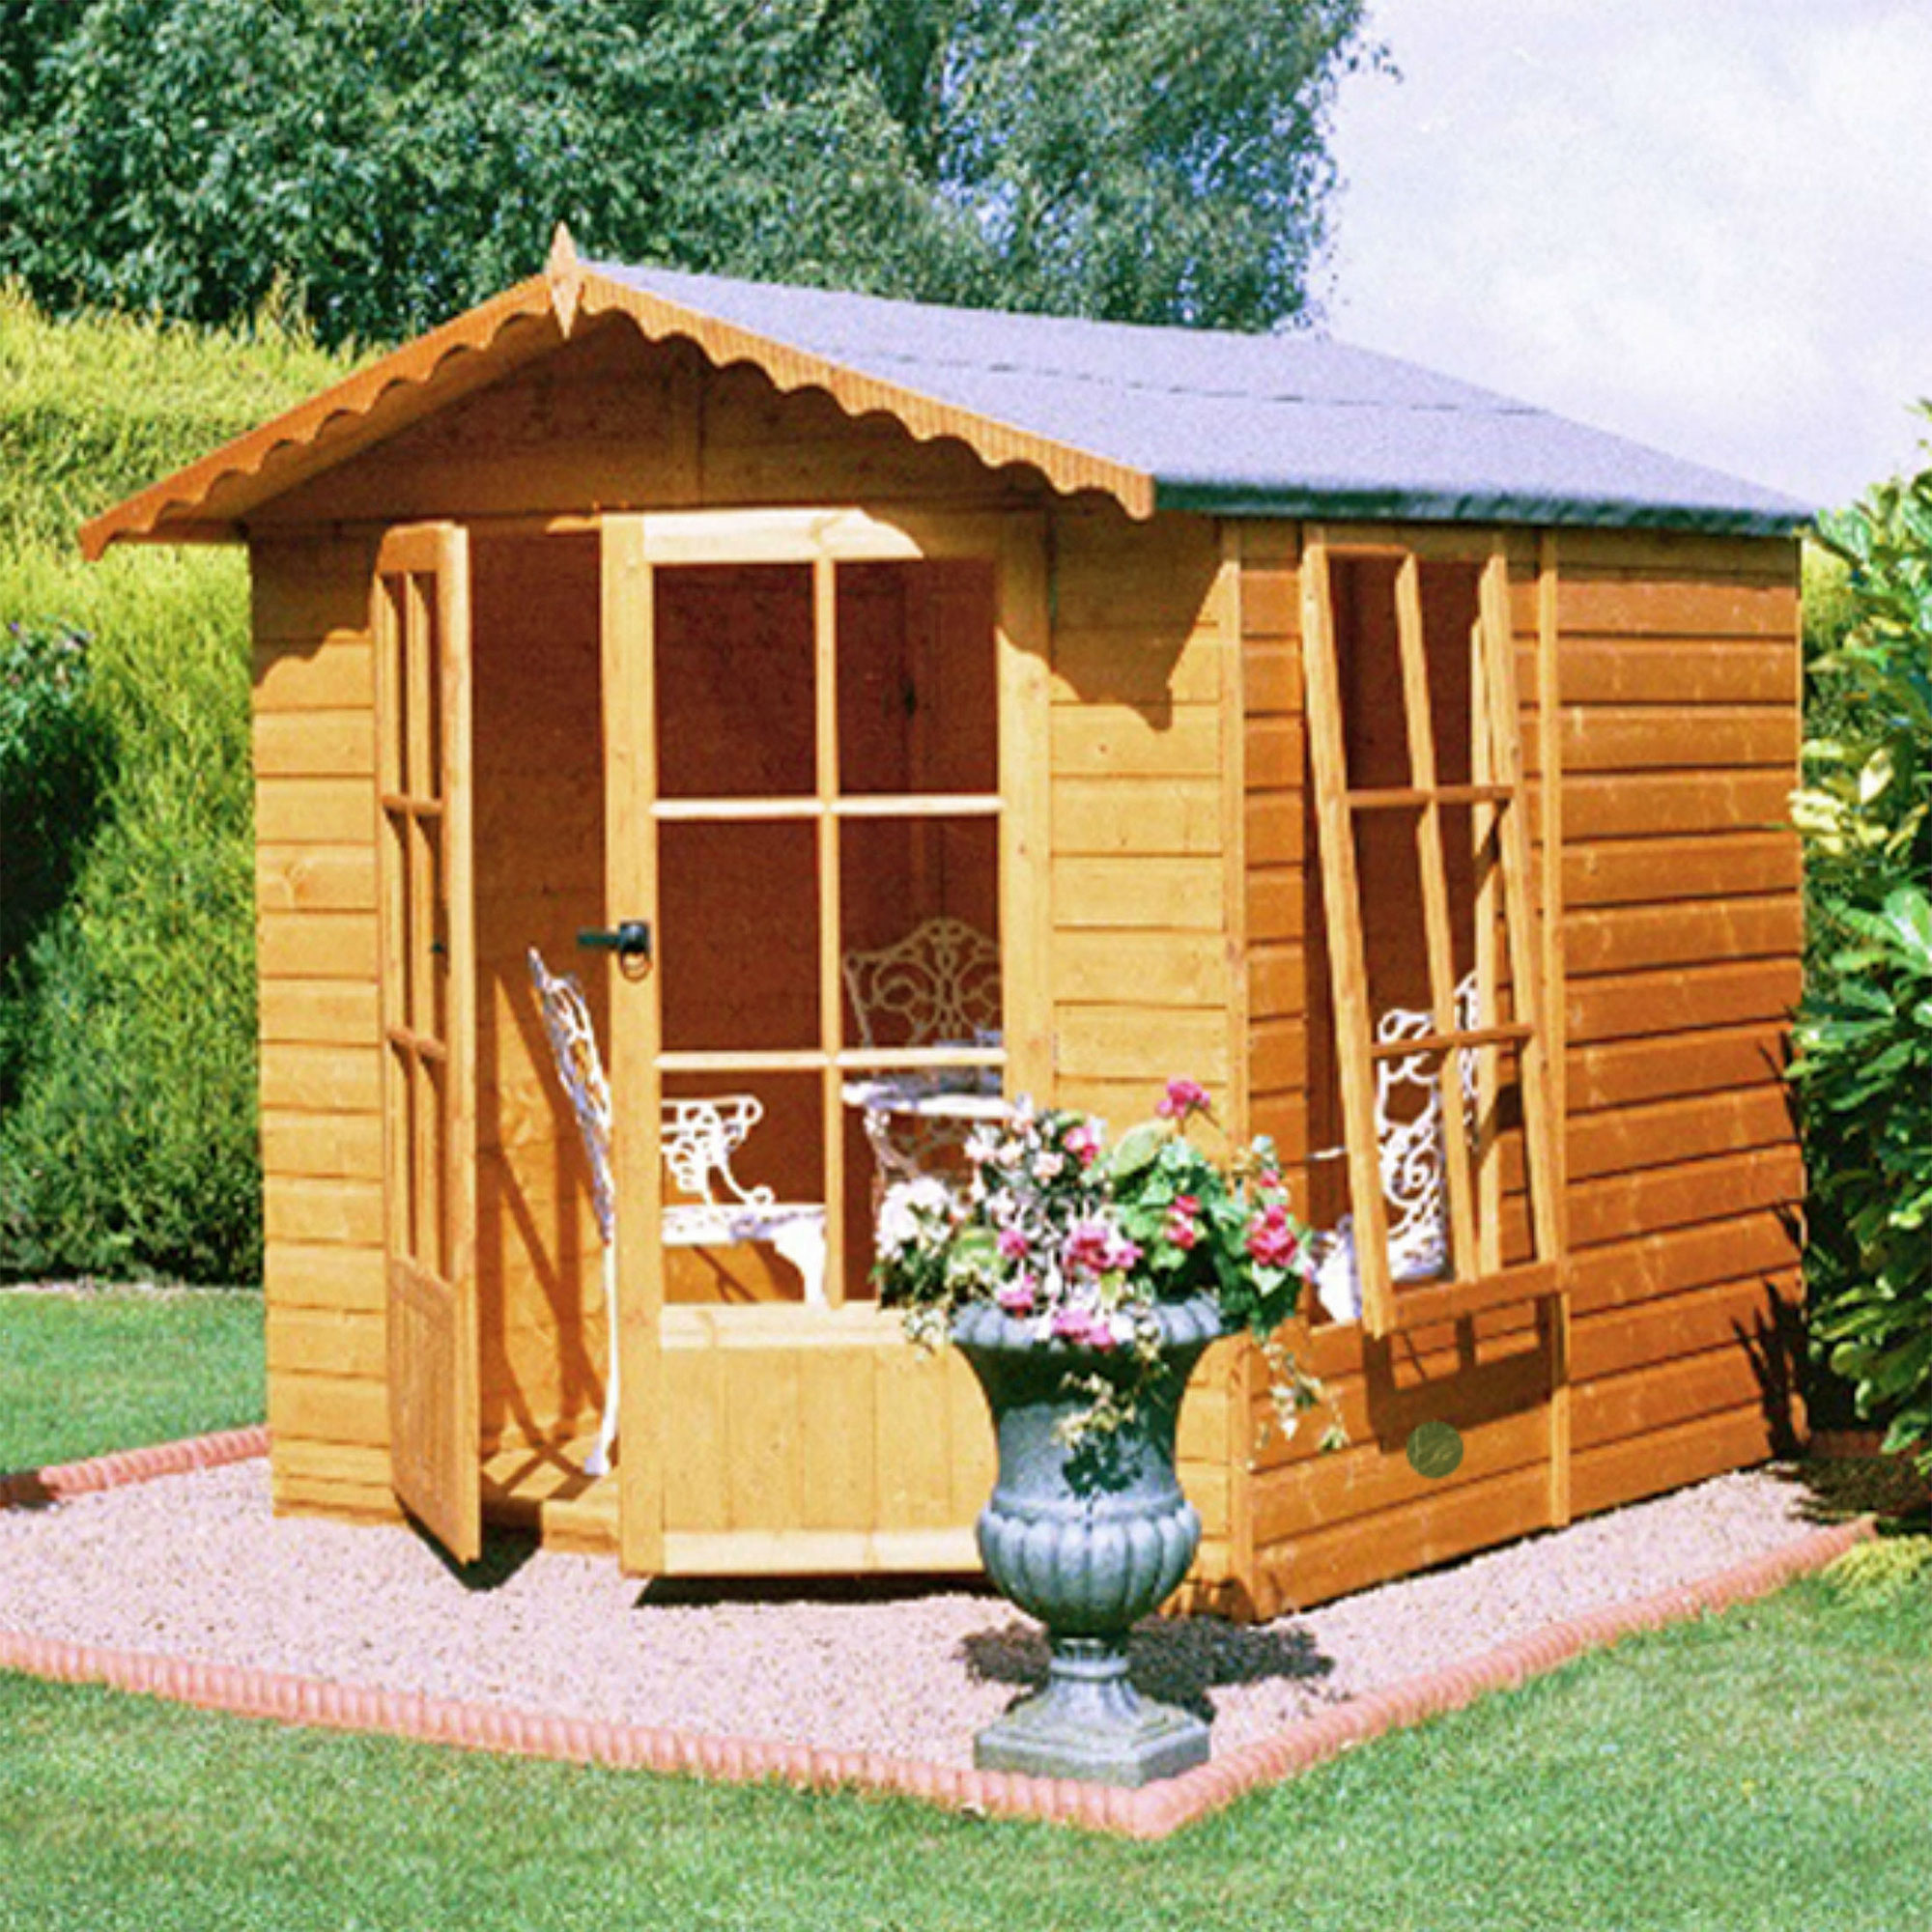 6'6 x 6'9 Shire Buckingham Garden Summerhouse